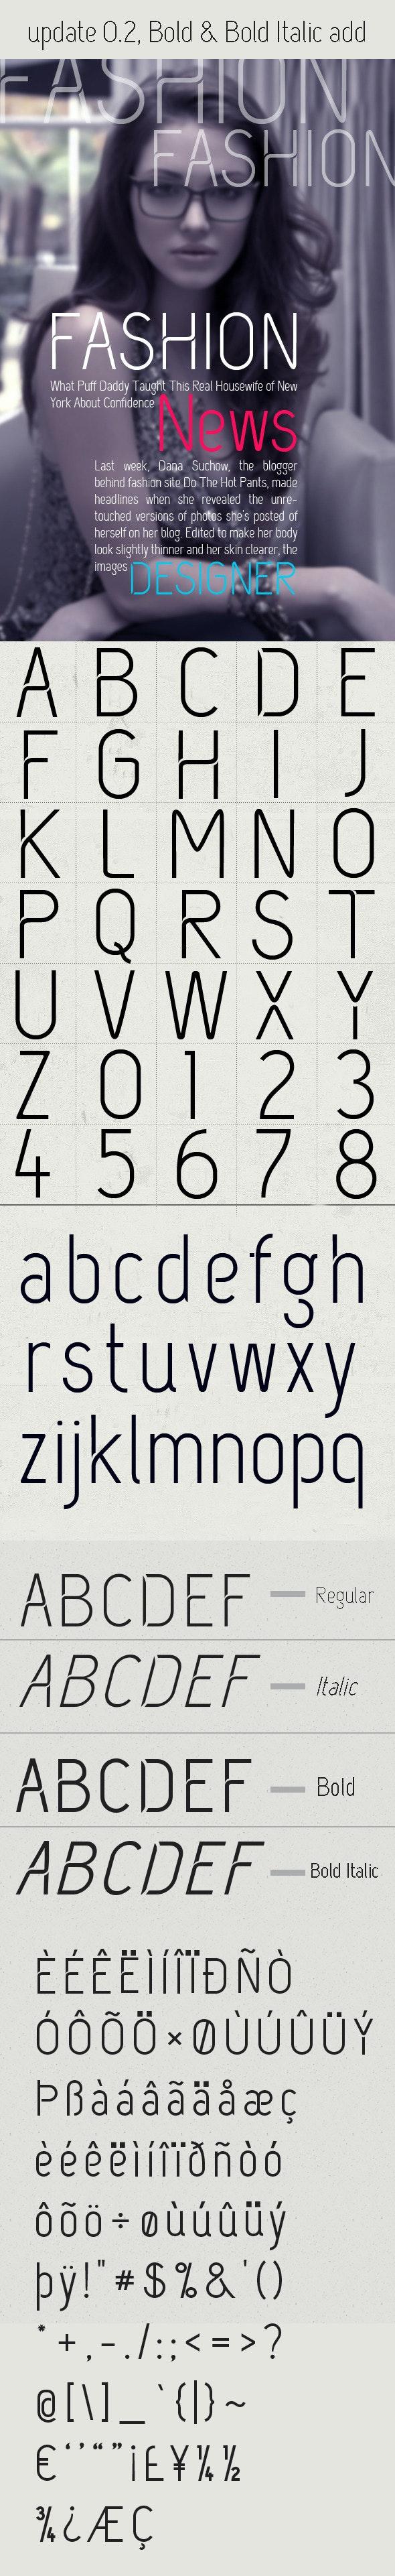 Fashion Font - Sans-Serif Fonts